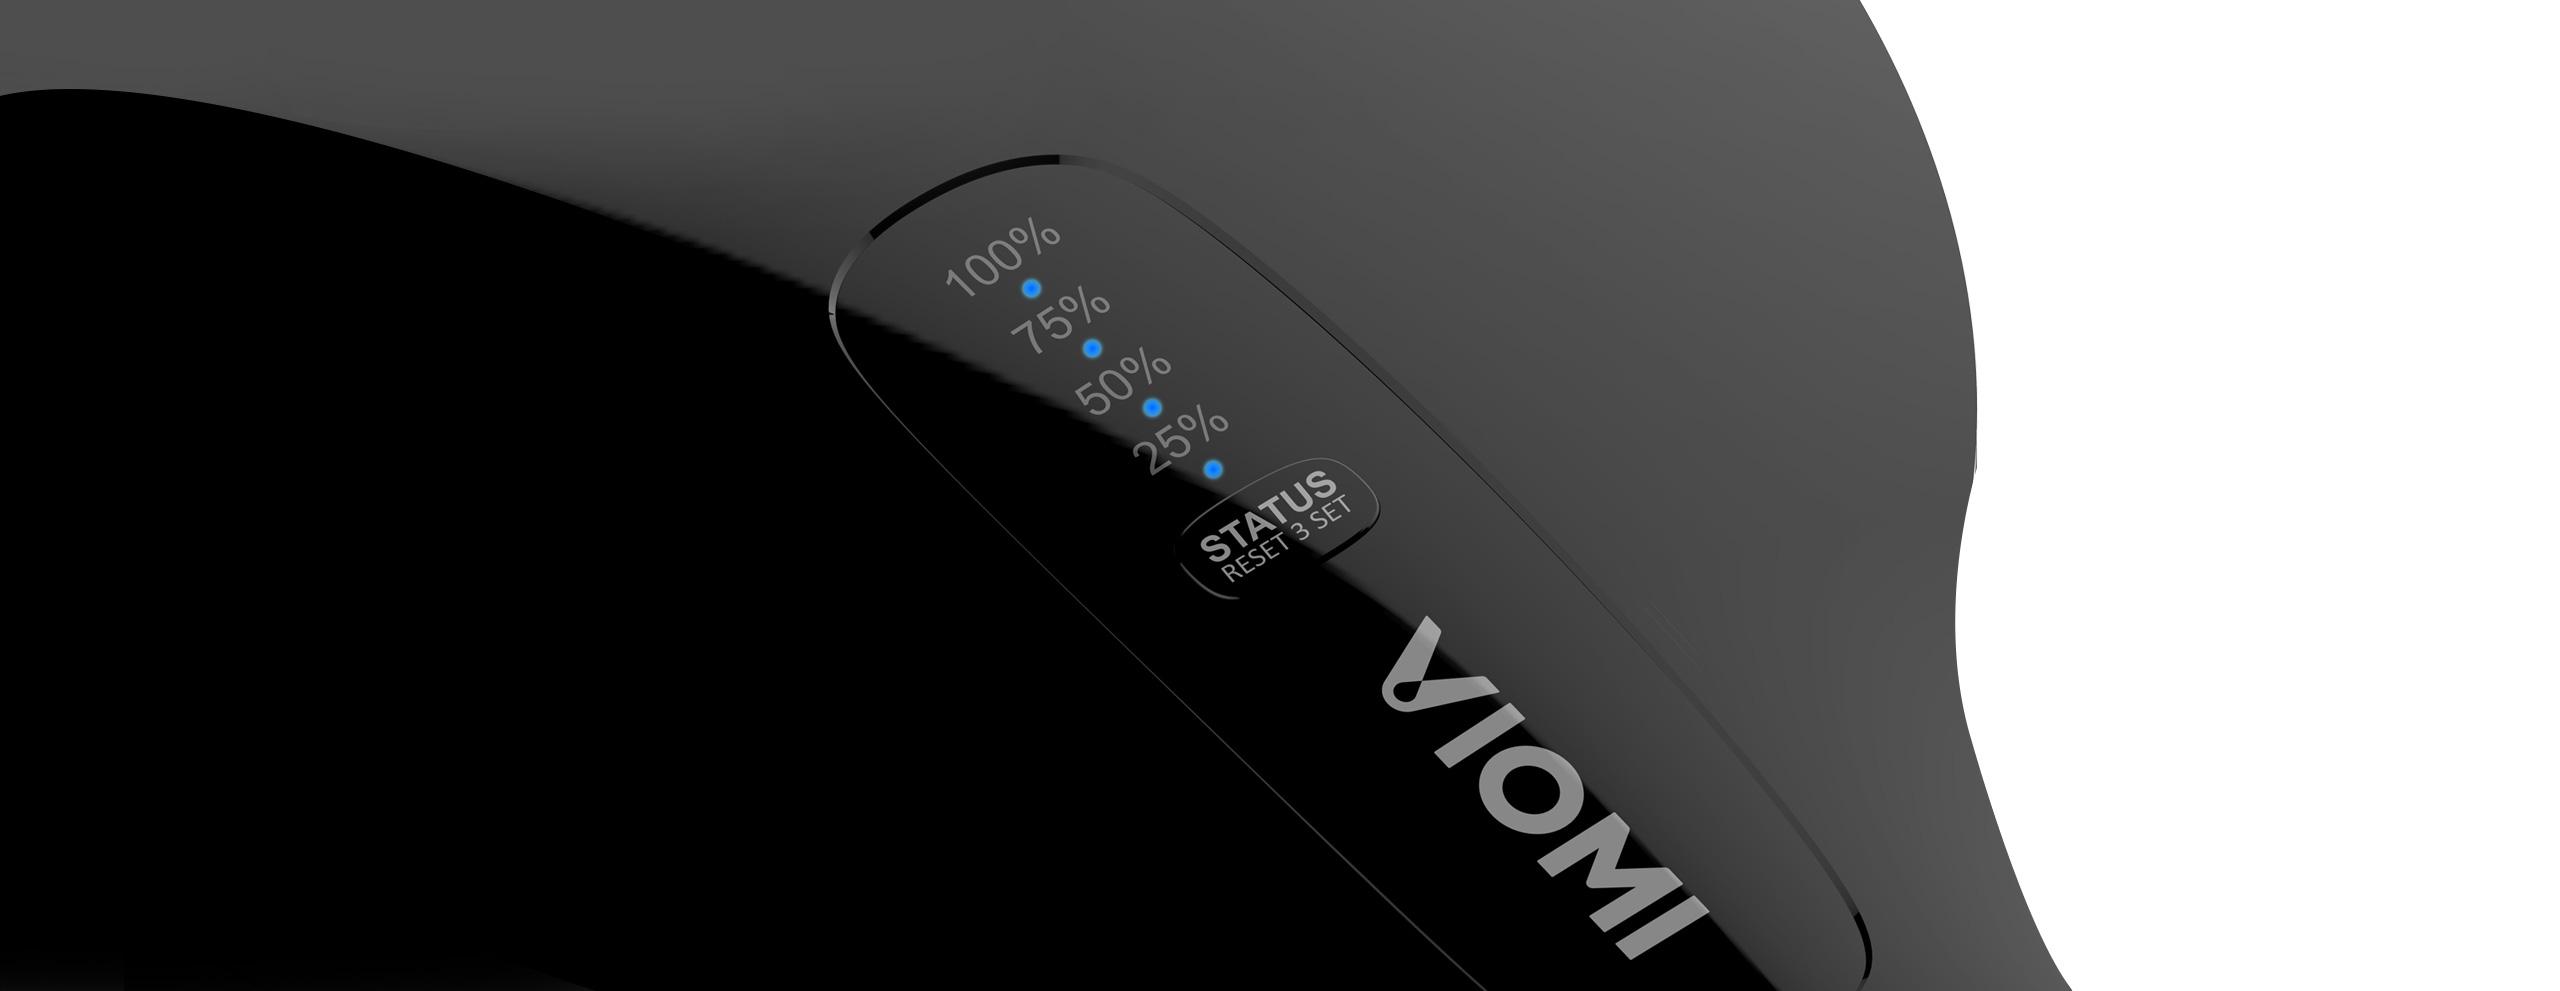 Xiaomi Viomi Filter Kettle - индикация ресурса картриджа